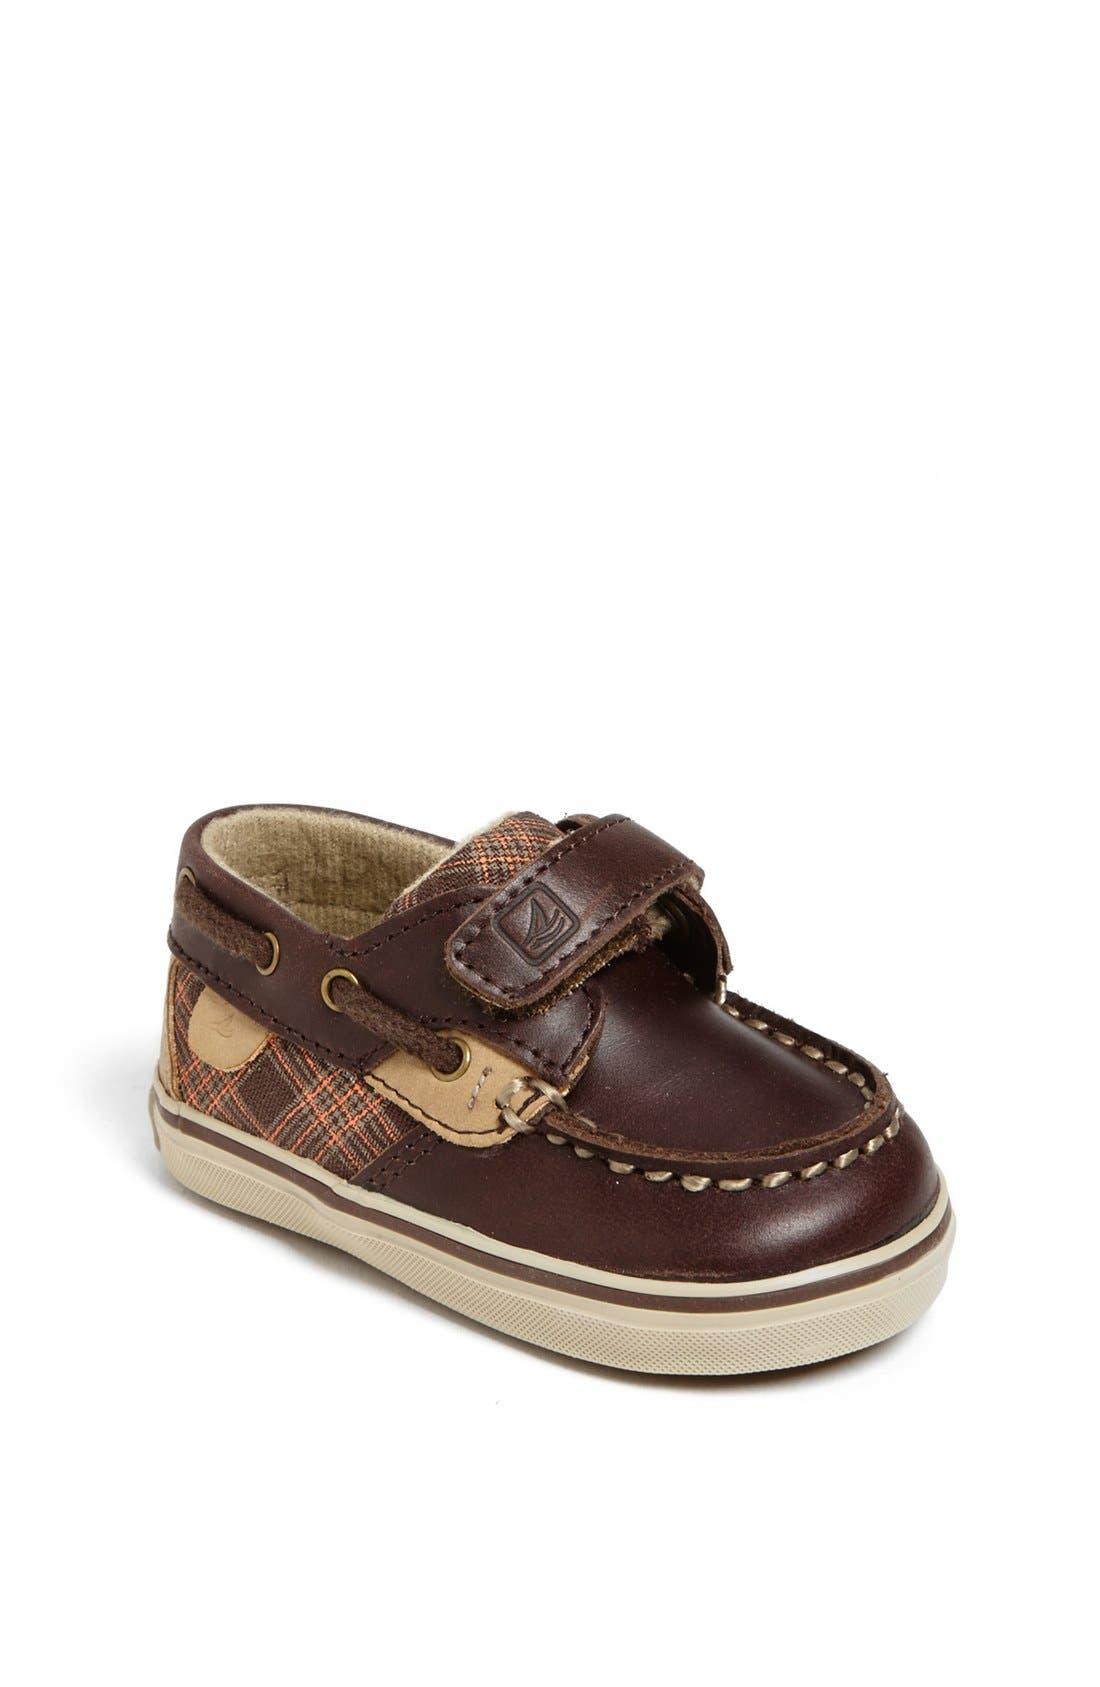 Main Image - Sperry Kids 'Bluefish' Crib Shoe (Baby)